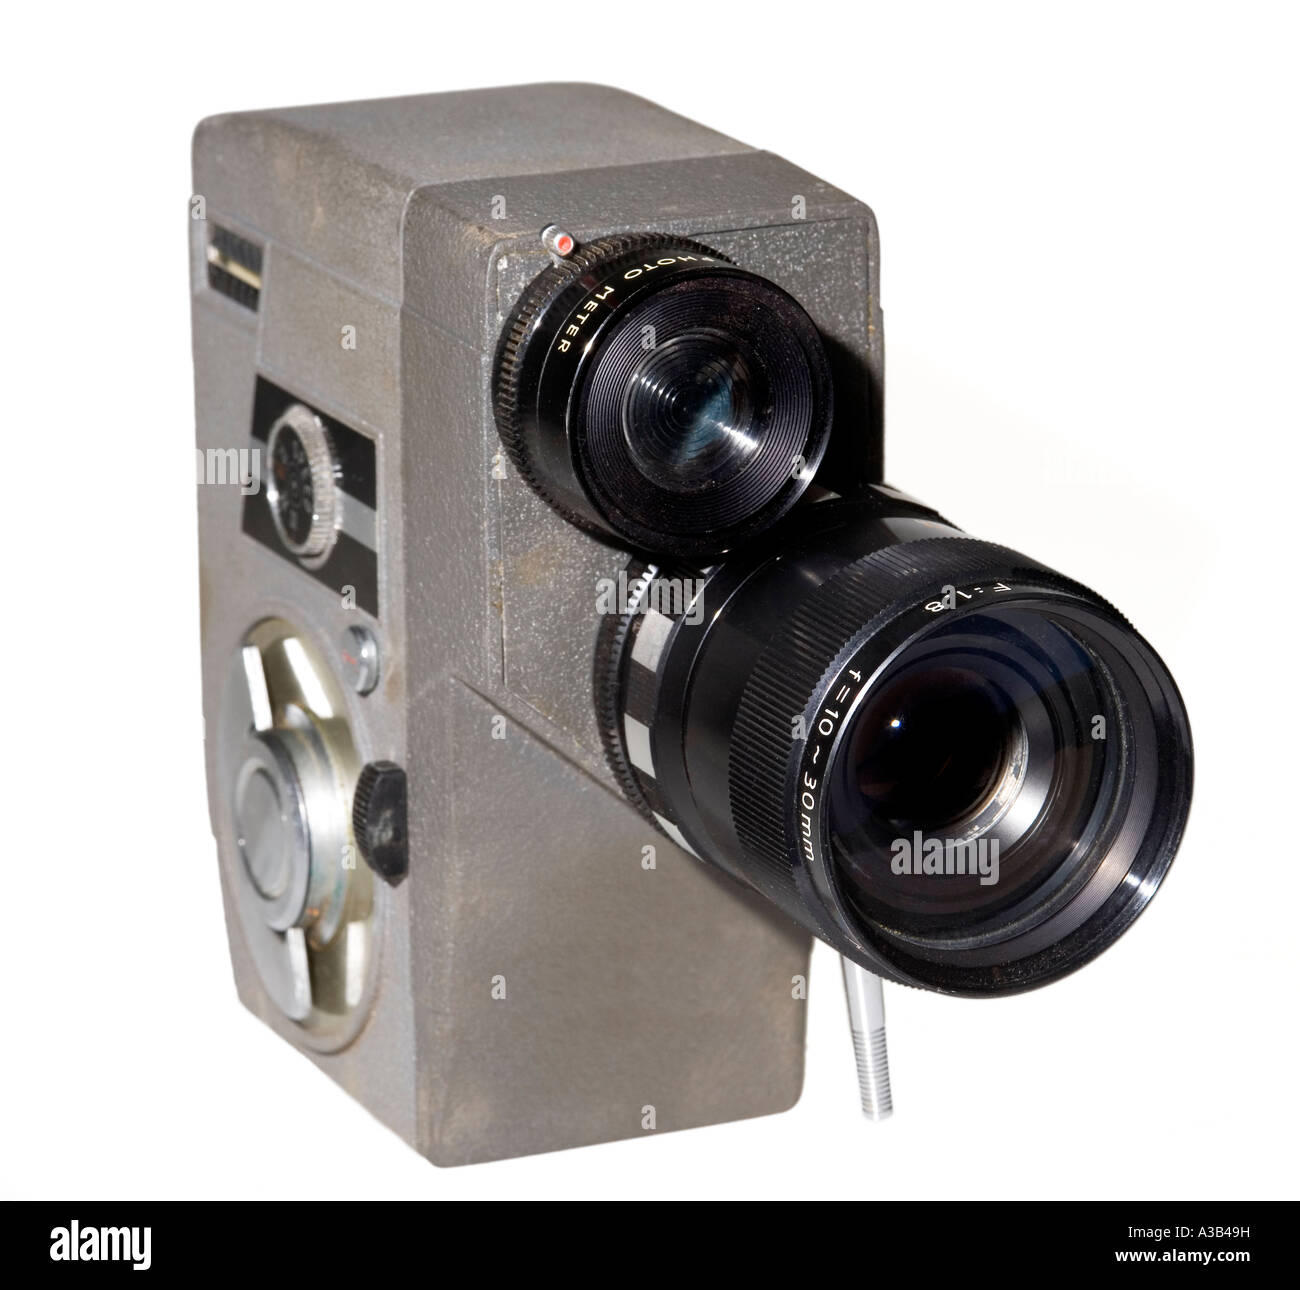 Clockwork Amateur 8mm cámara de película de cine del 1960 Imagen De Stock